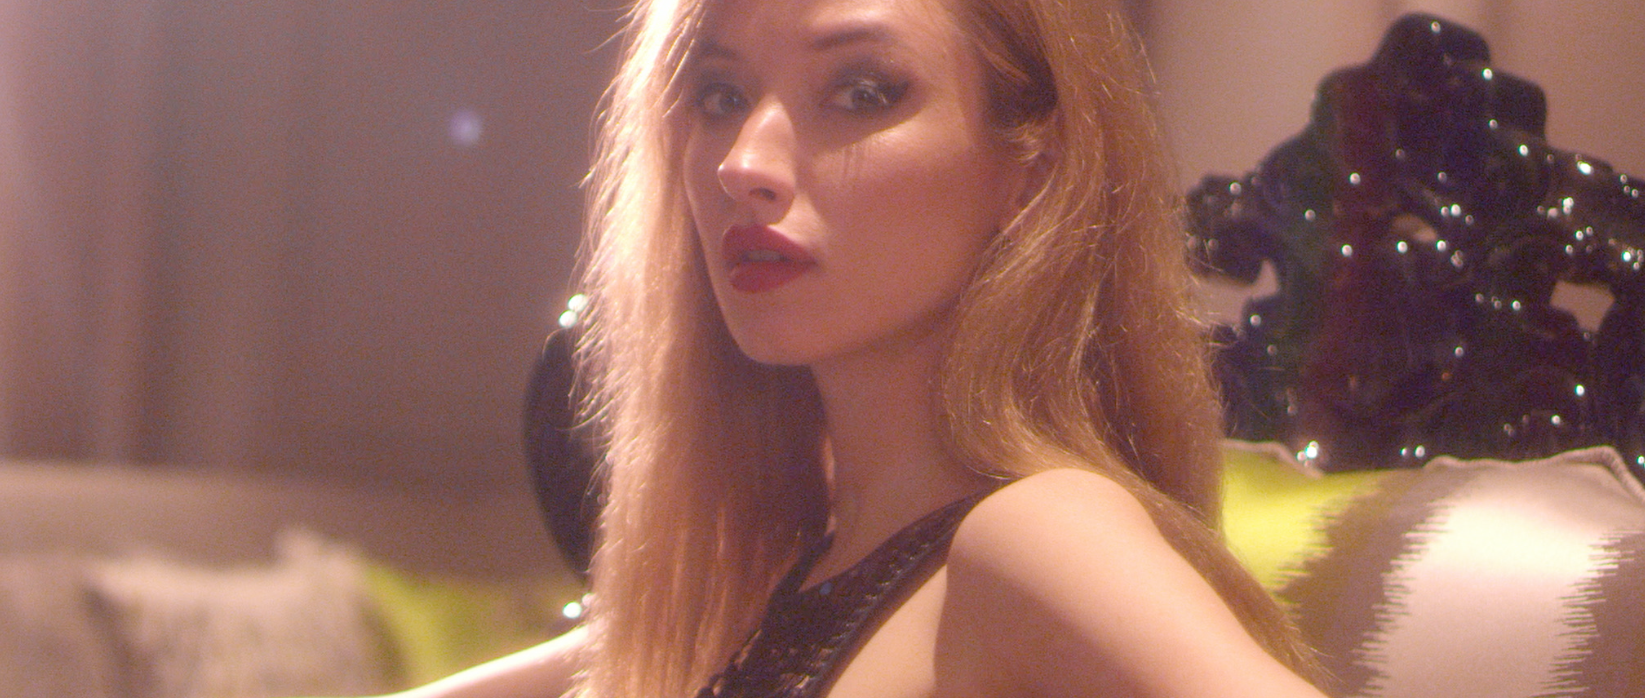 Shanghai Wardrobe Stylist Hair and Make Up Artist Fashion Film Los Angeles California